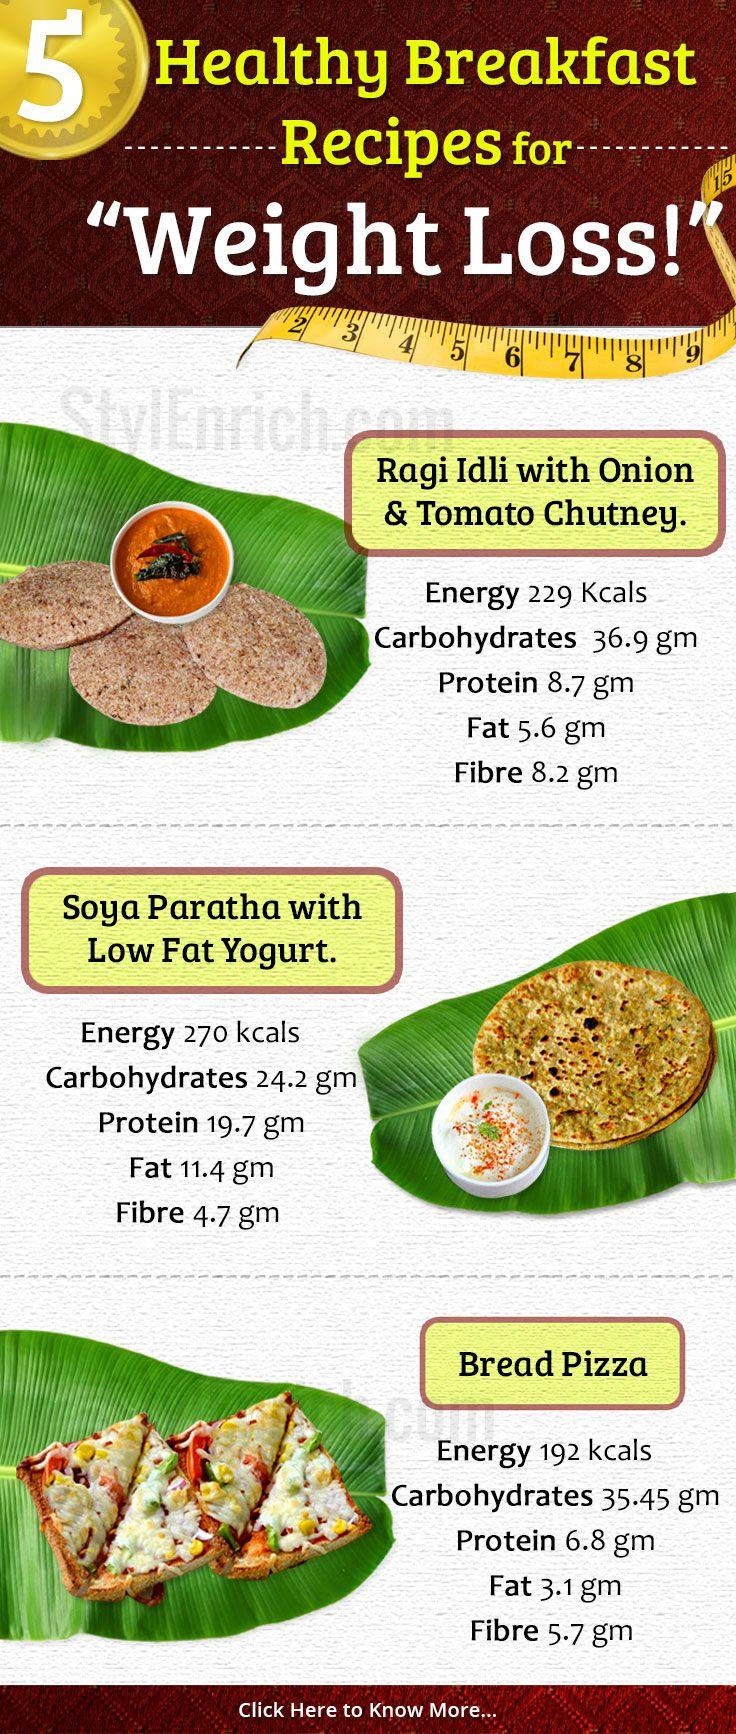 Meal plan for full liquid diet image 4